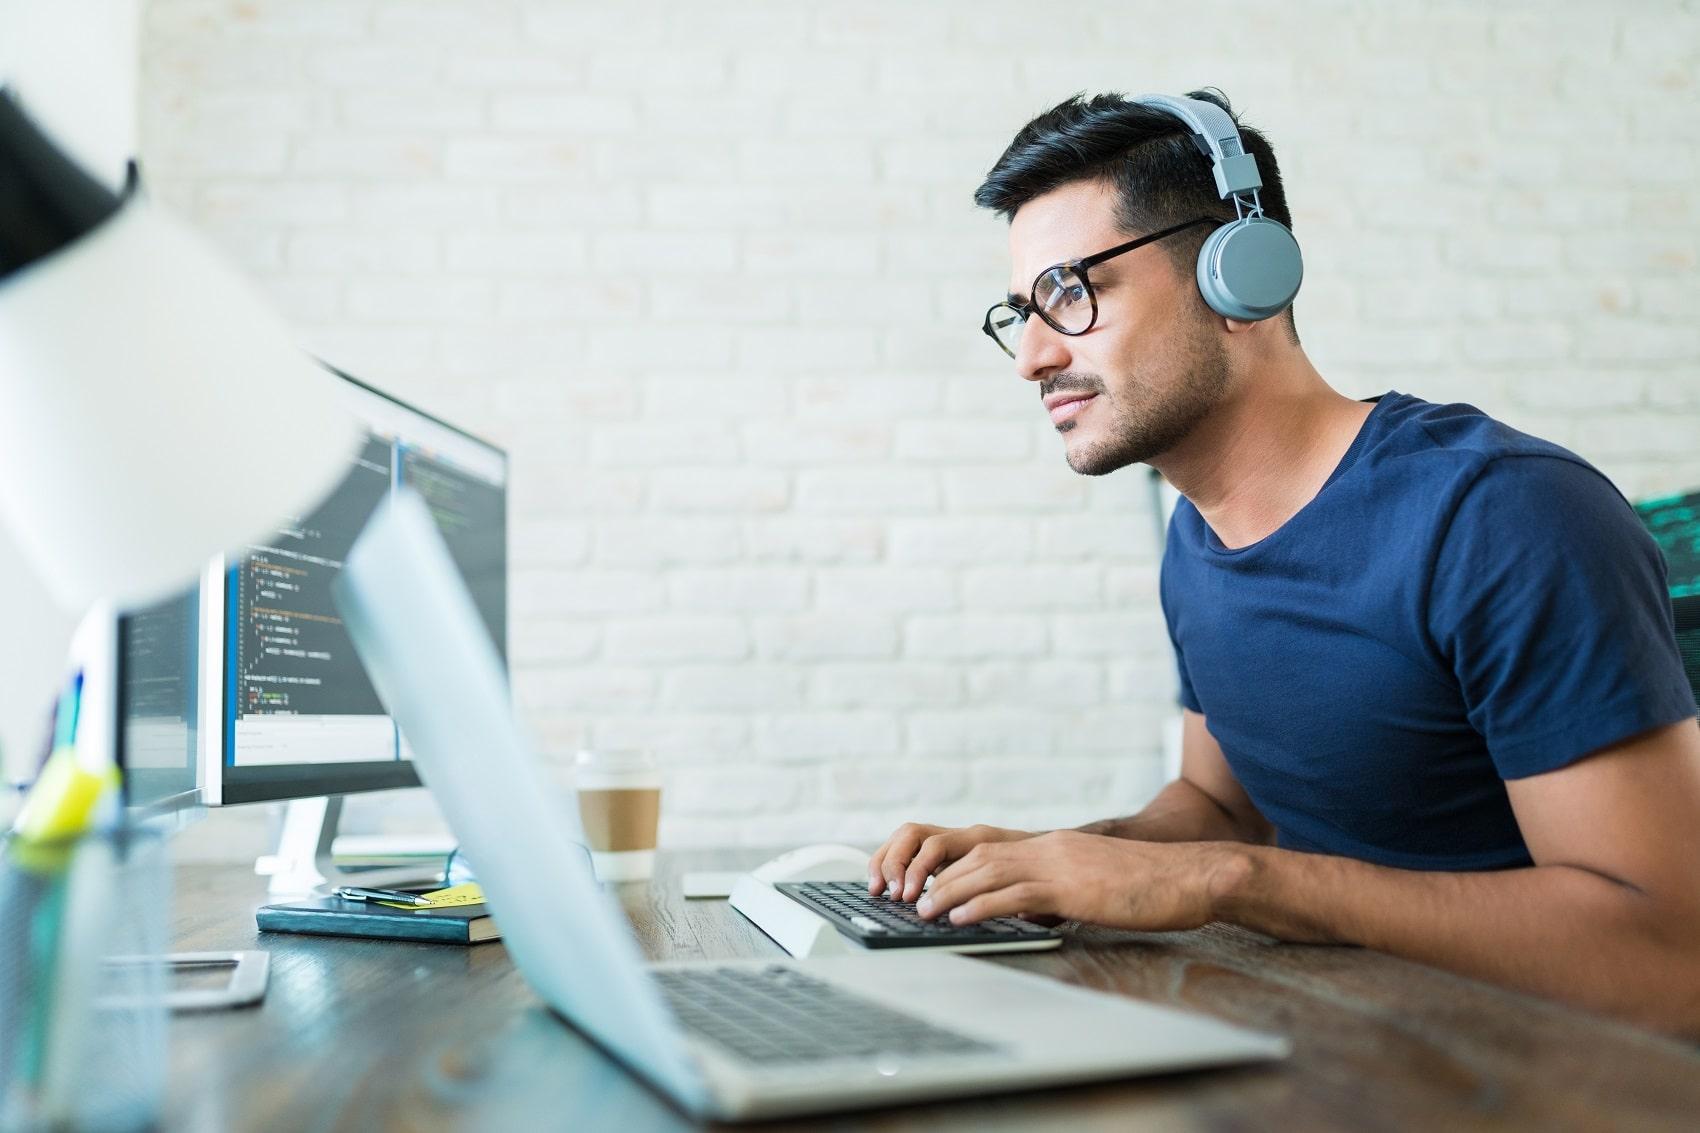 Software developer programming at desk, wearing headphones